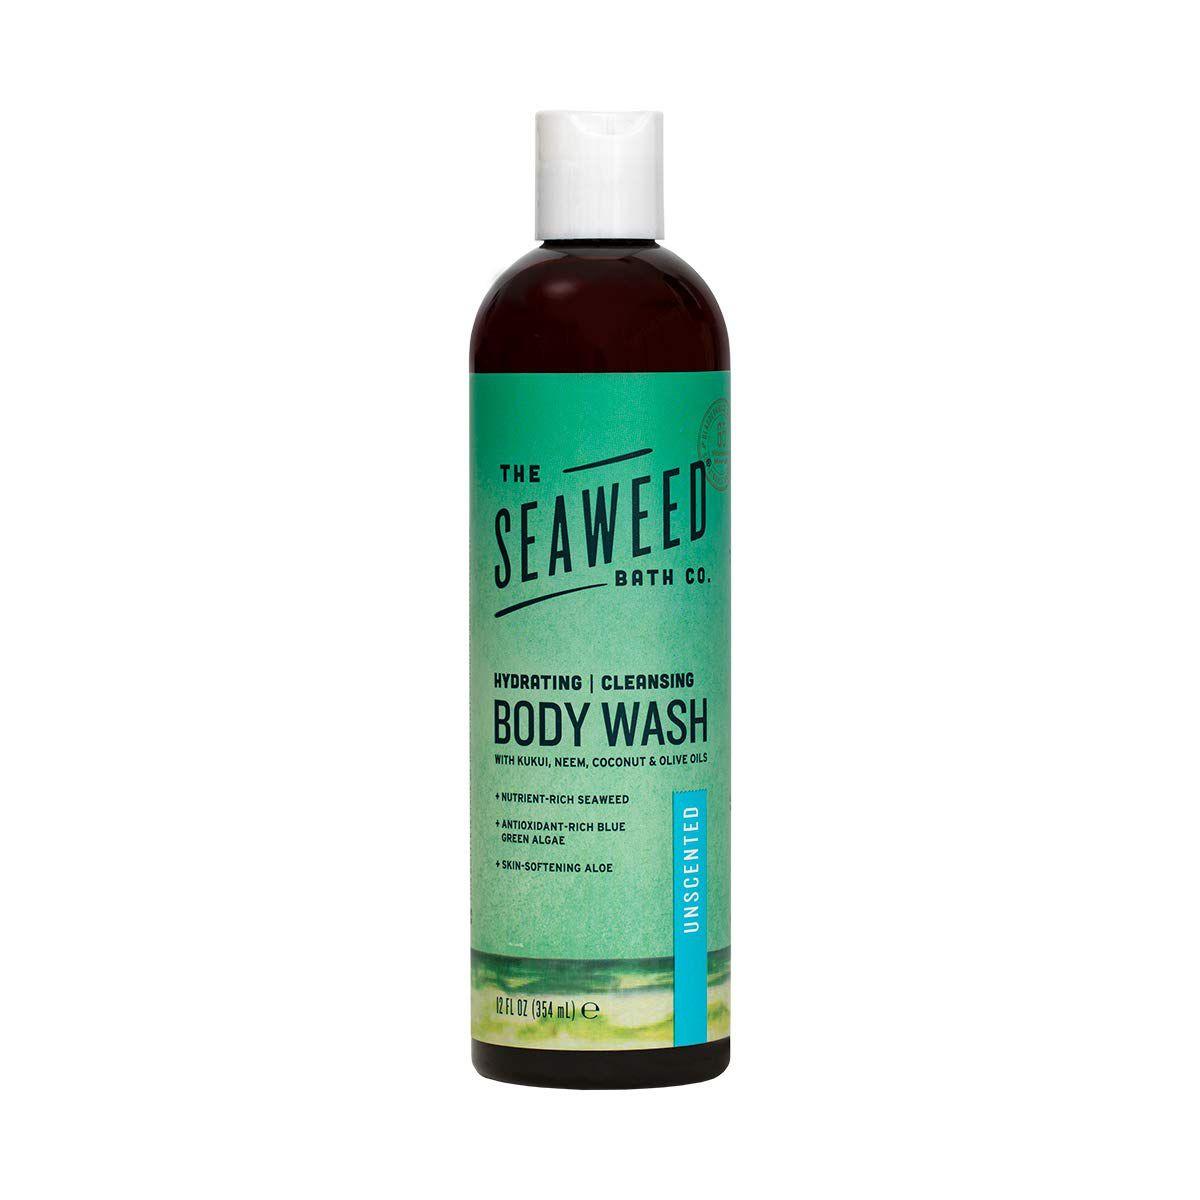 The Seaweed Bath Co. Hydrating Cleansing Body Wash